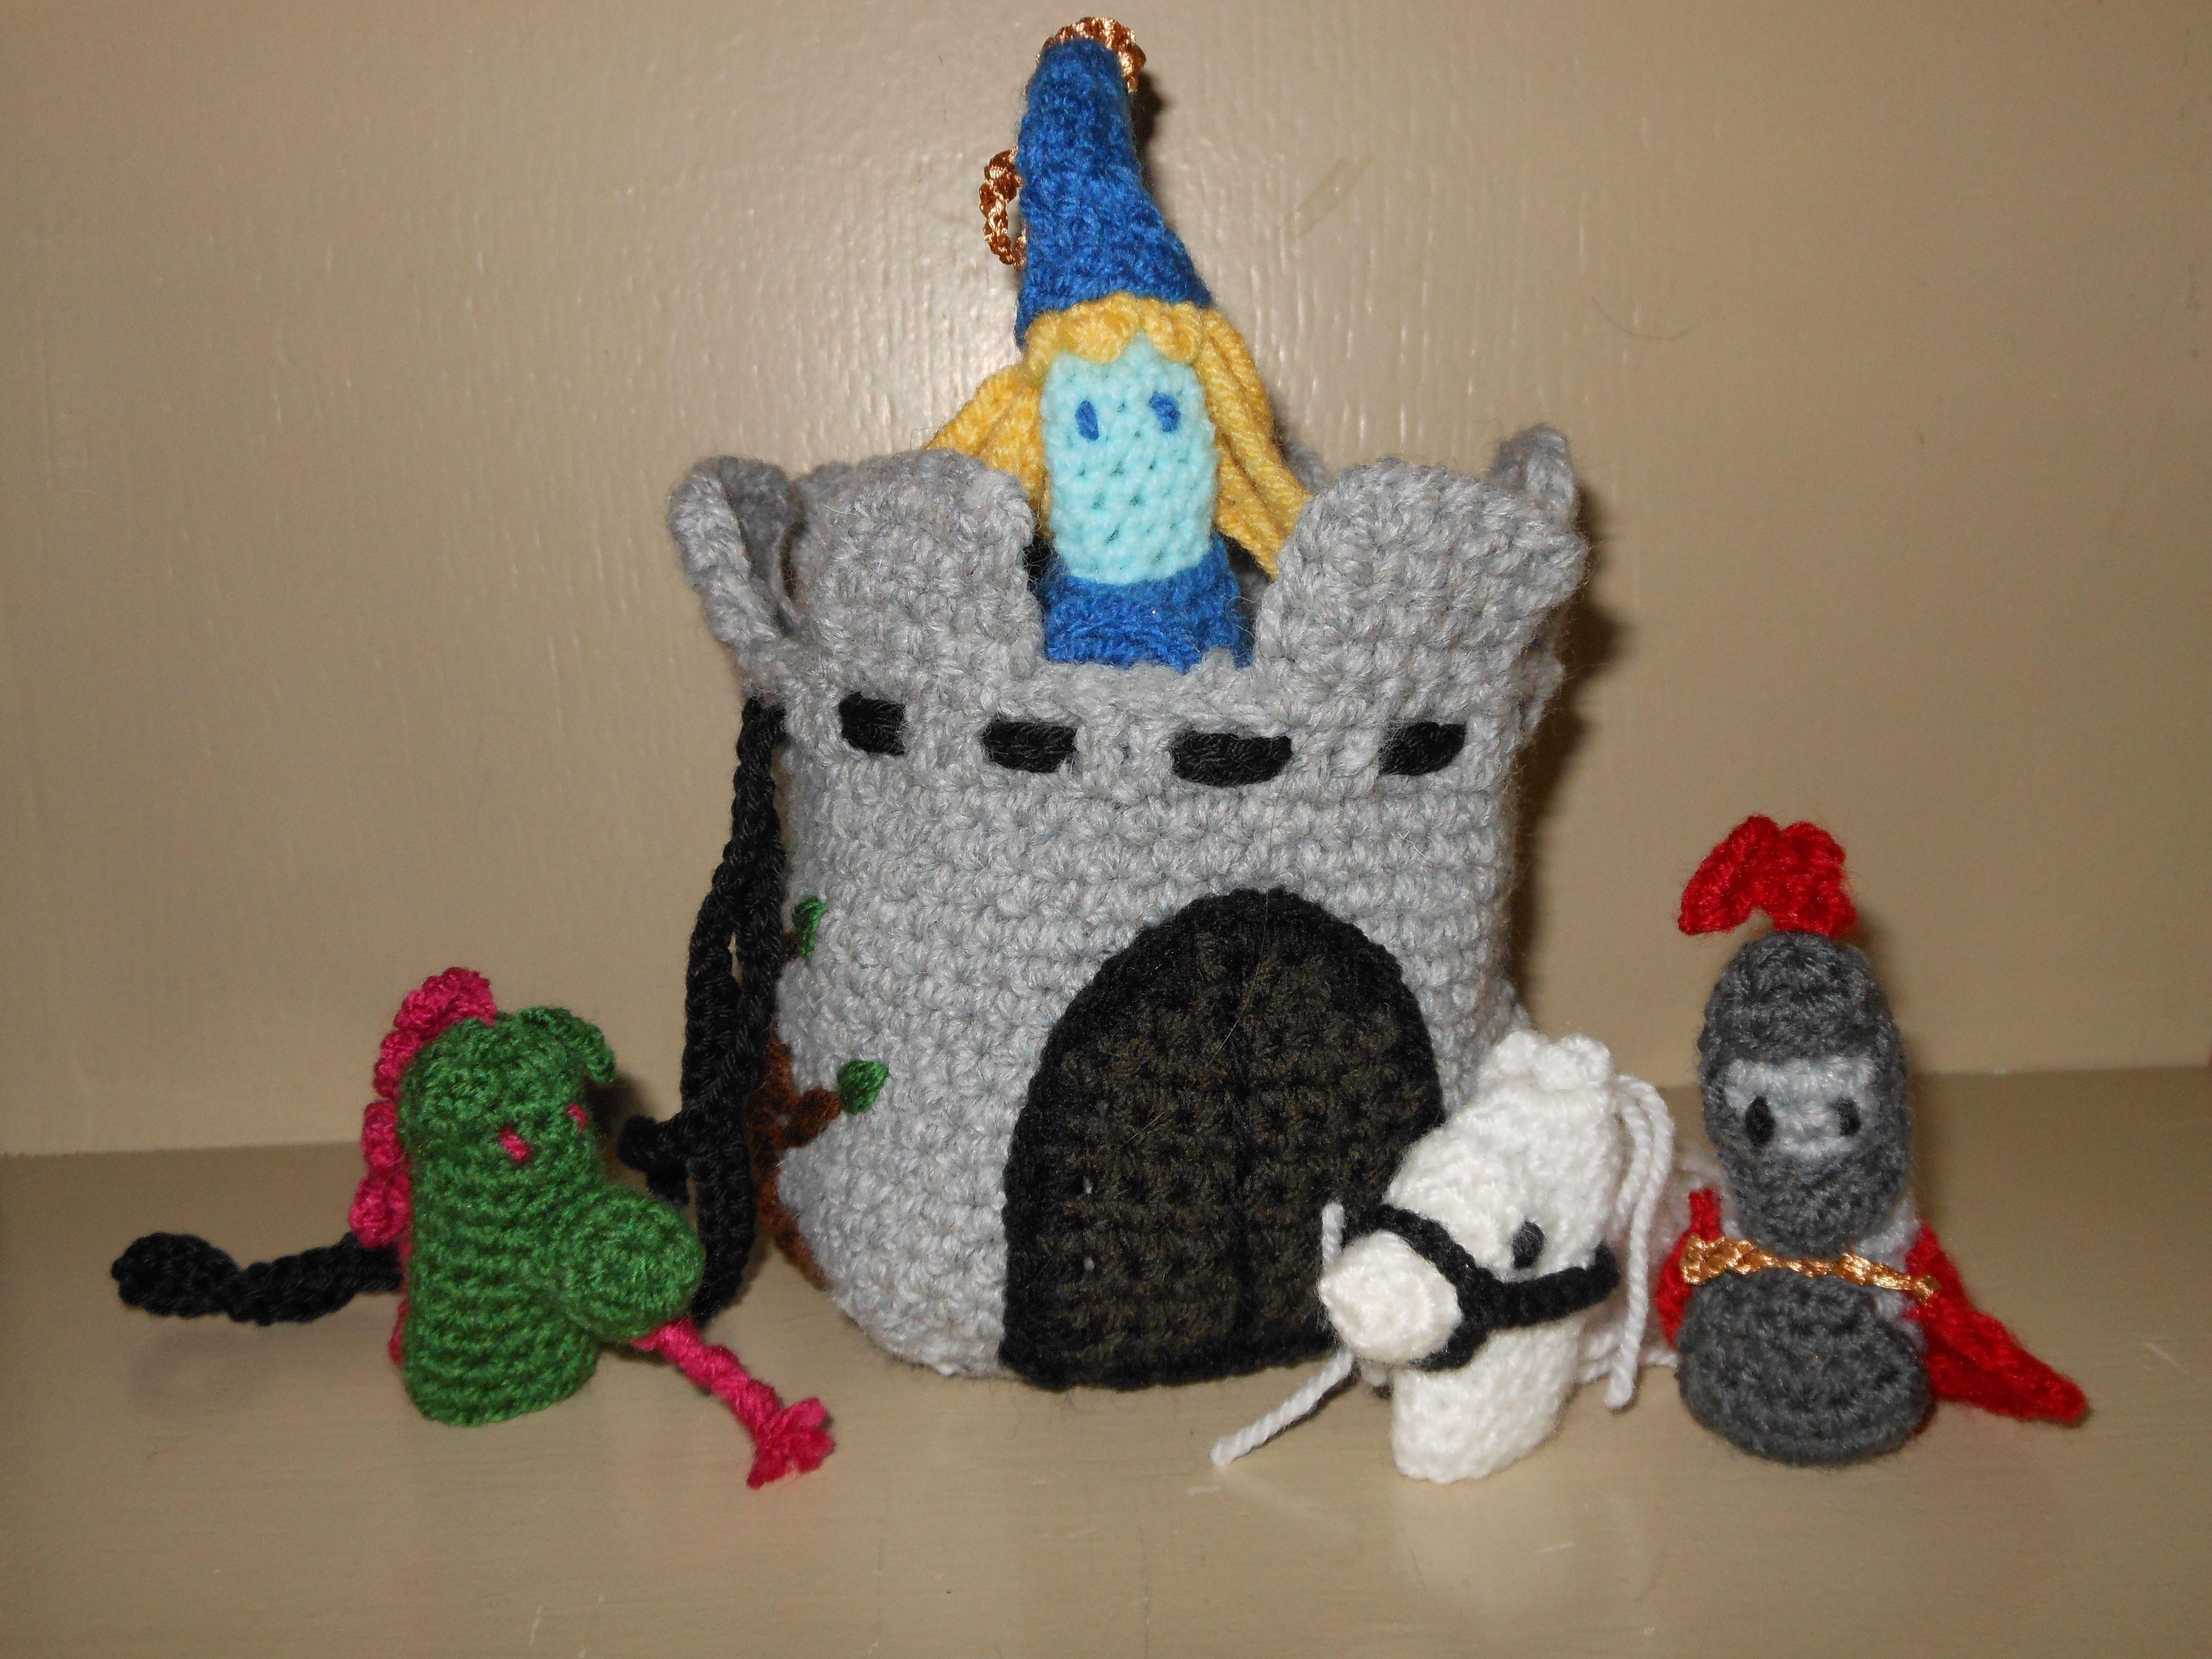 vingerpopjes paard ridder princes draak en een kastelentasje